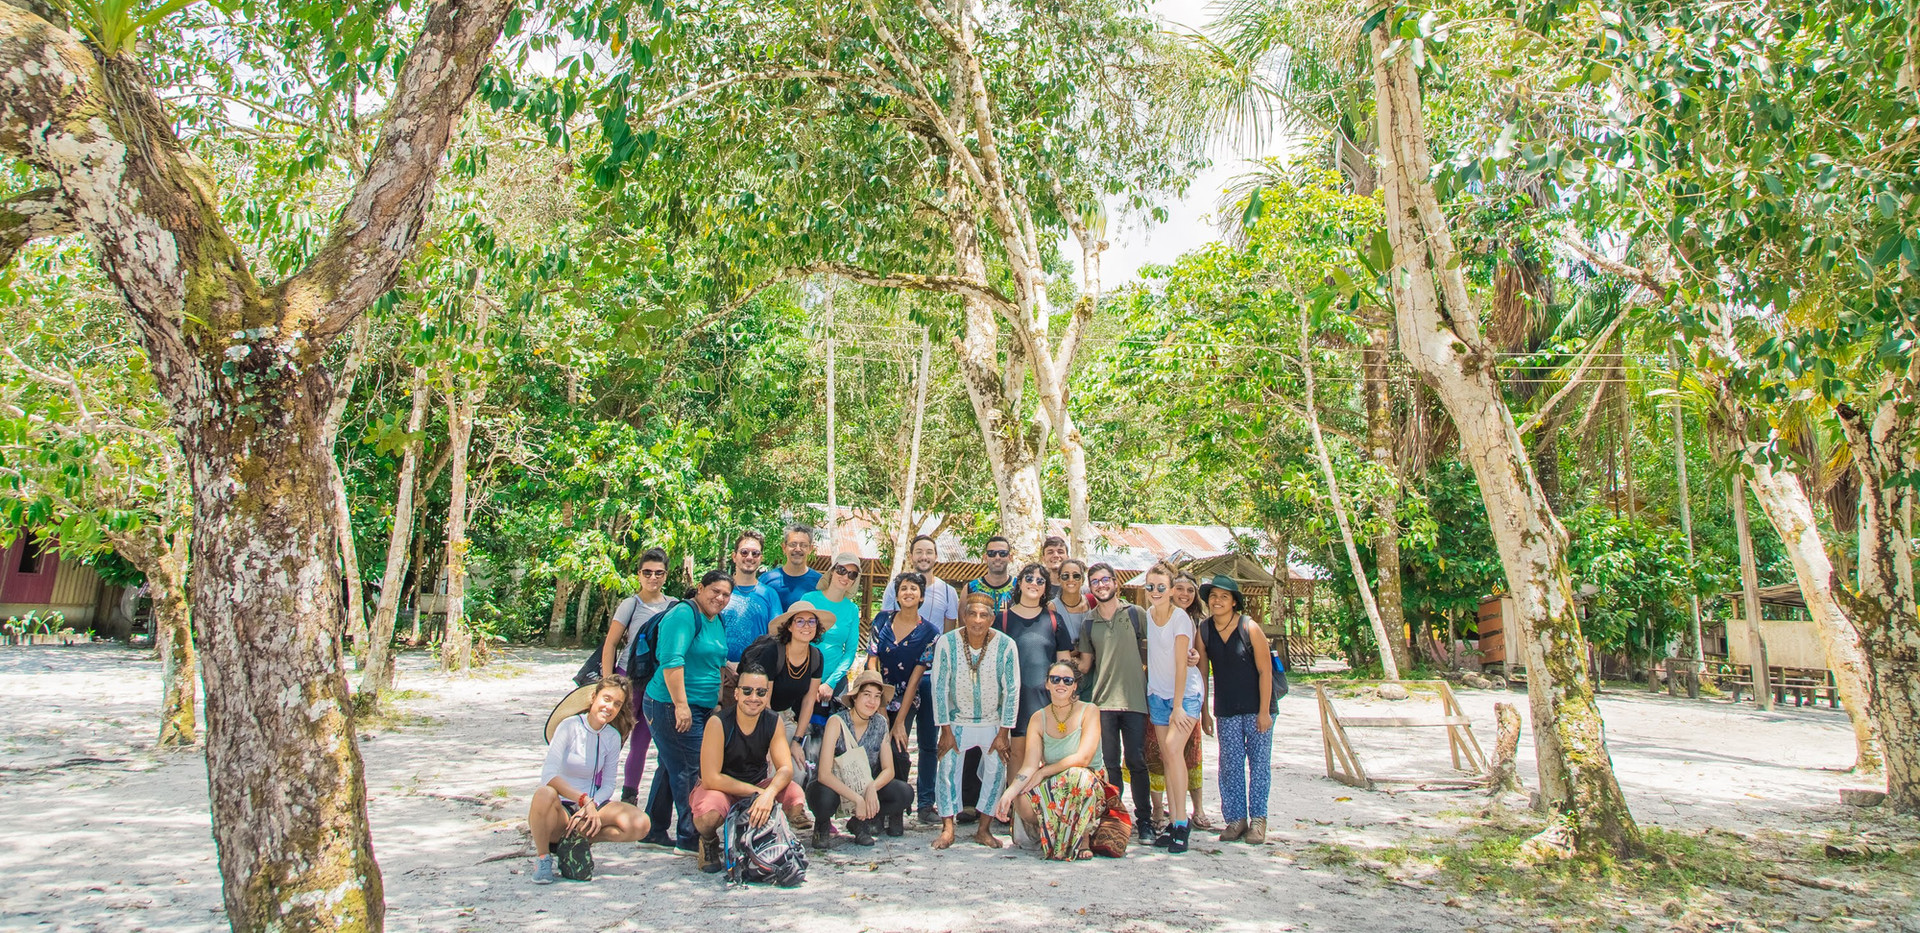 Expedicao amazonia 21 na comunidade Tres